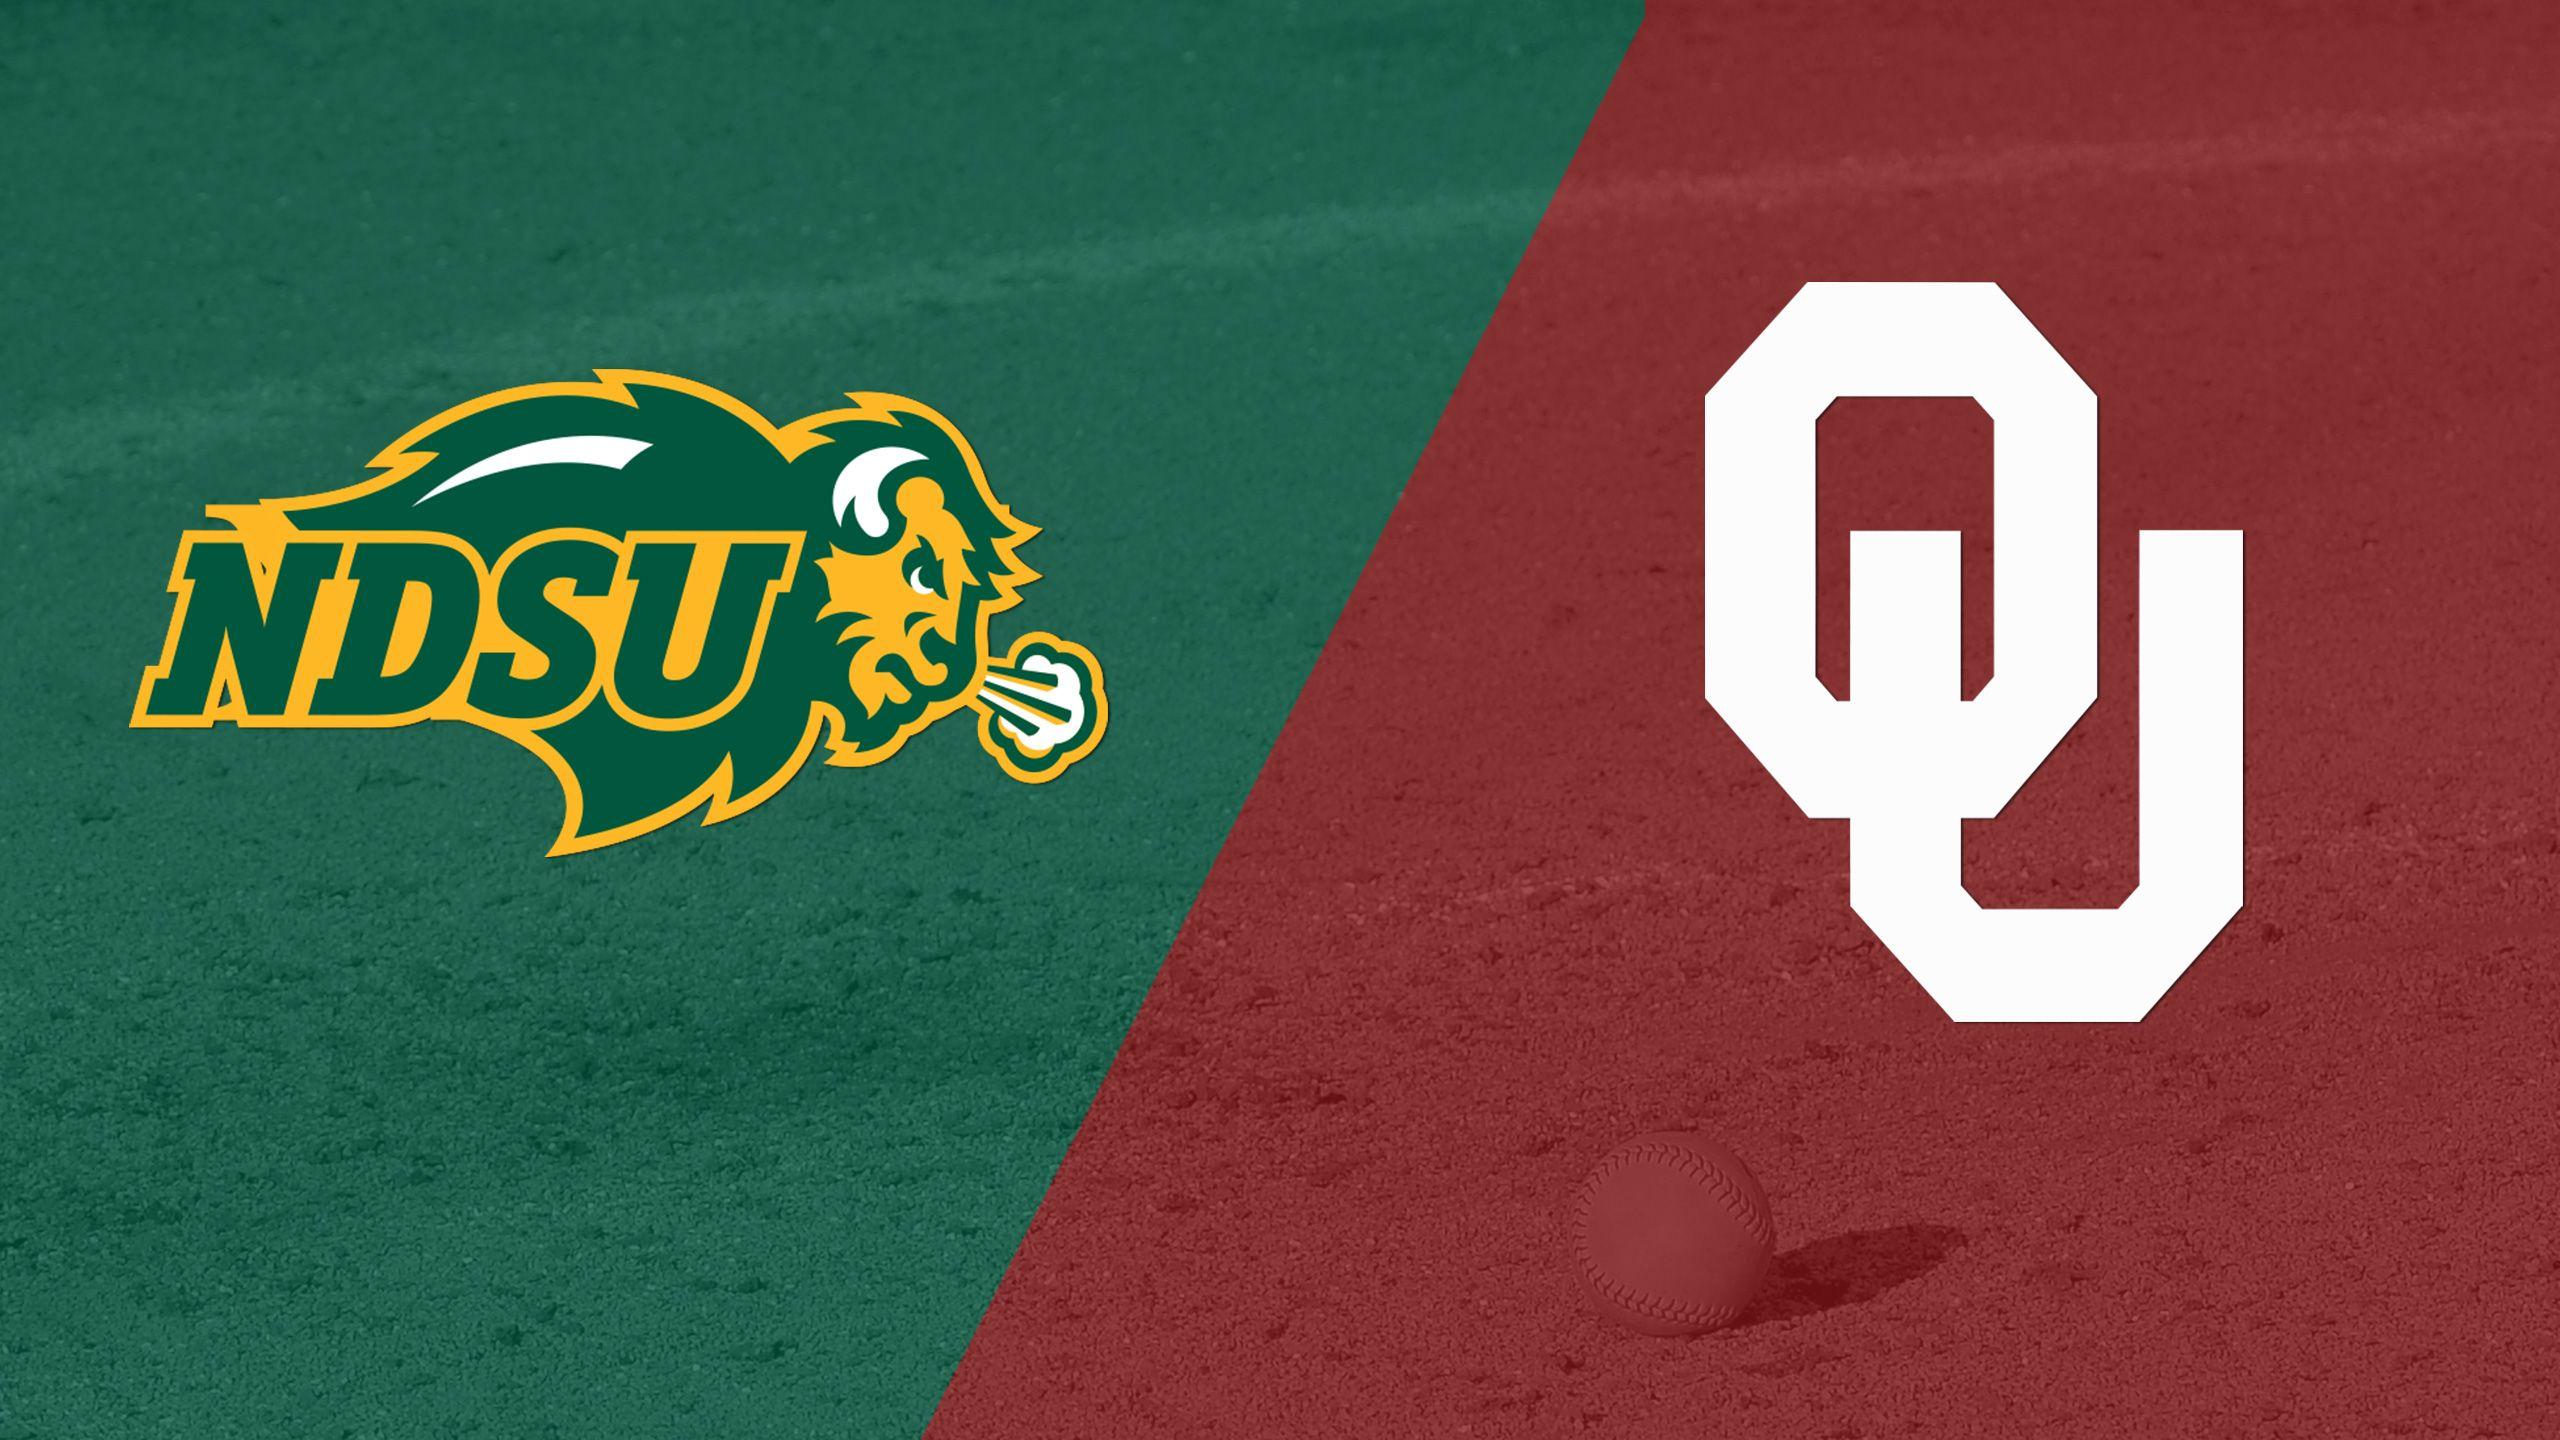 North Dakota State vs. #10 Oklahoma (Site 15 / Game 2) (NCAA Softball Championship)